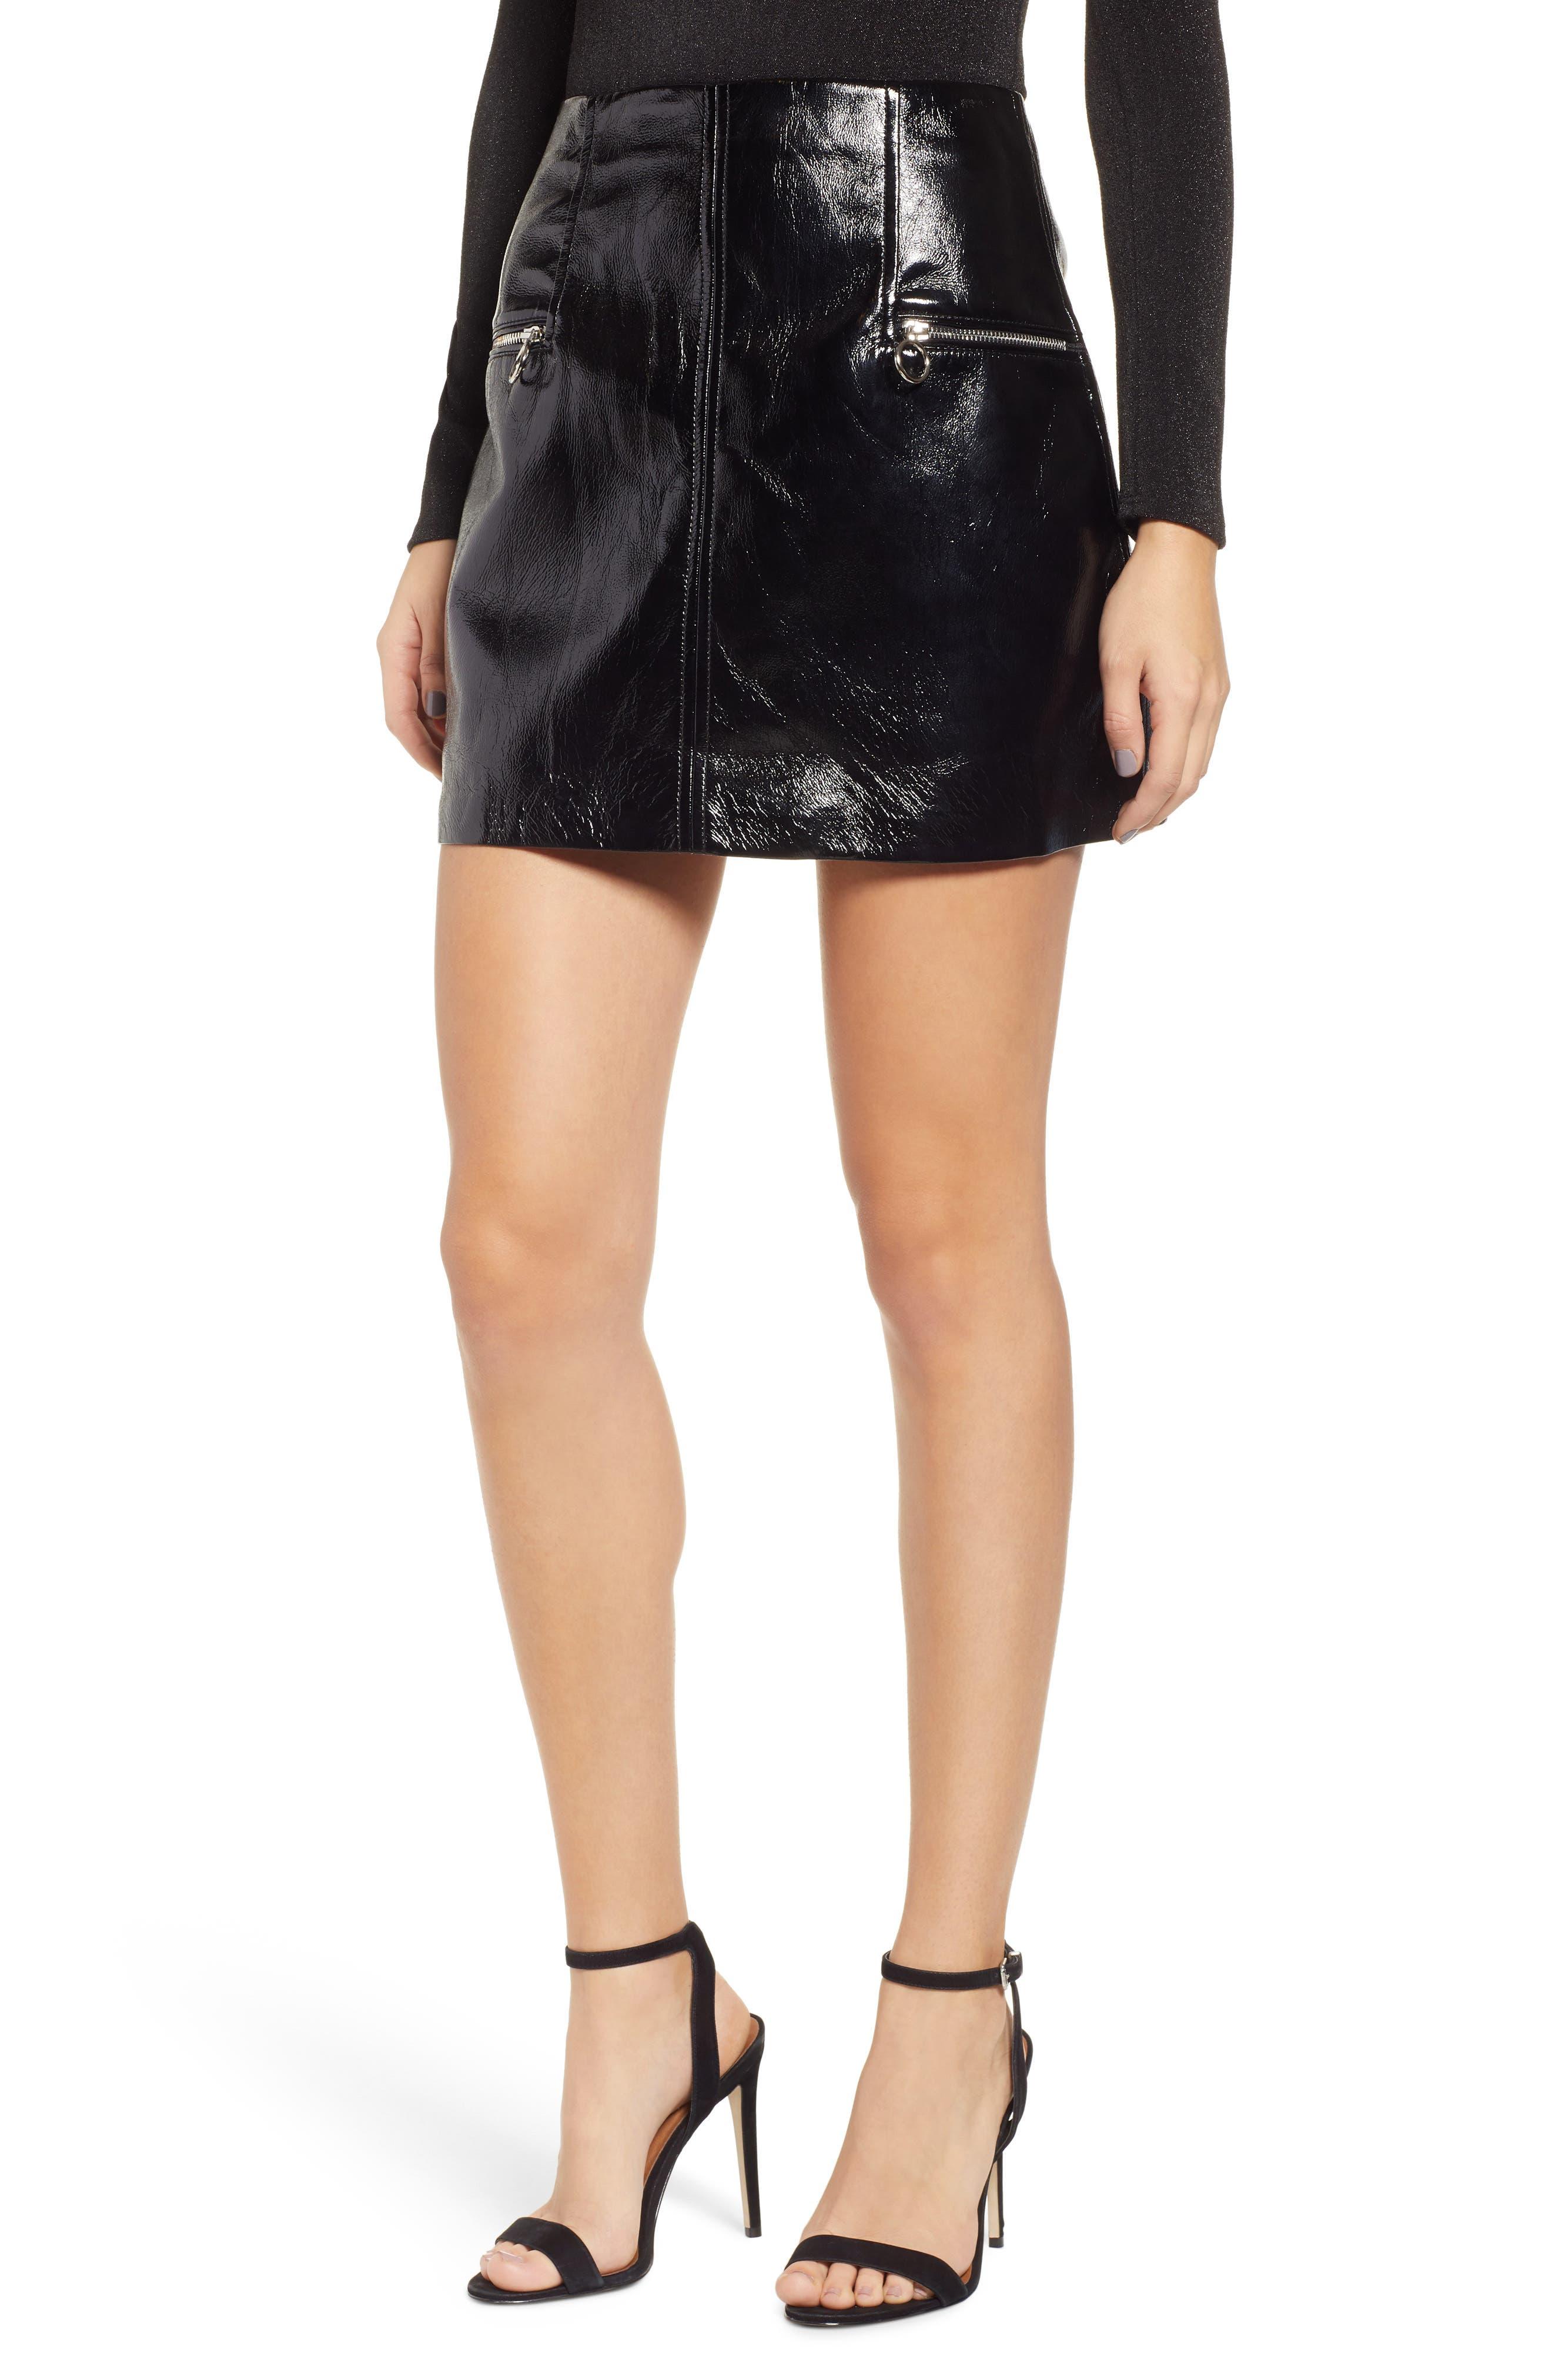 Blanknyc Faux Patent Leather Miniskirt, Black